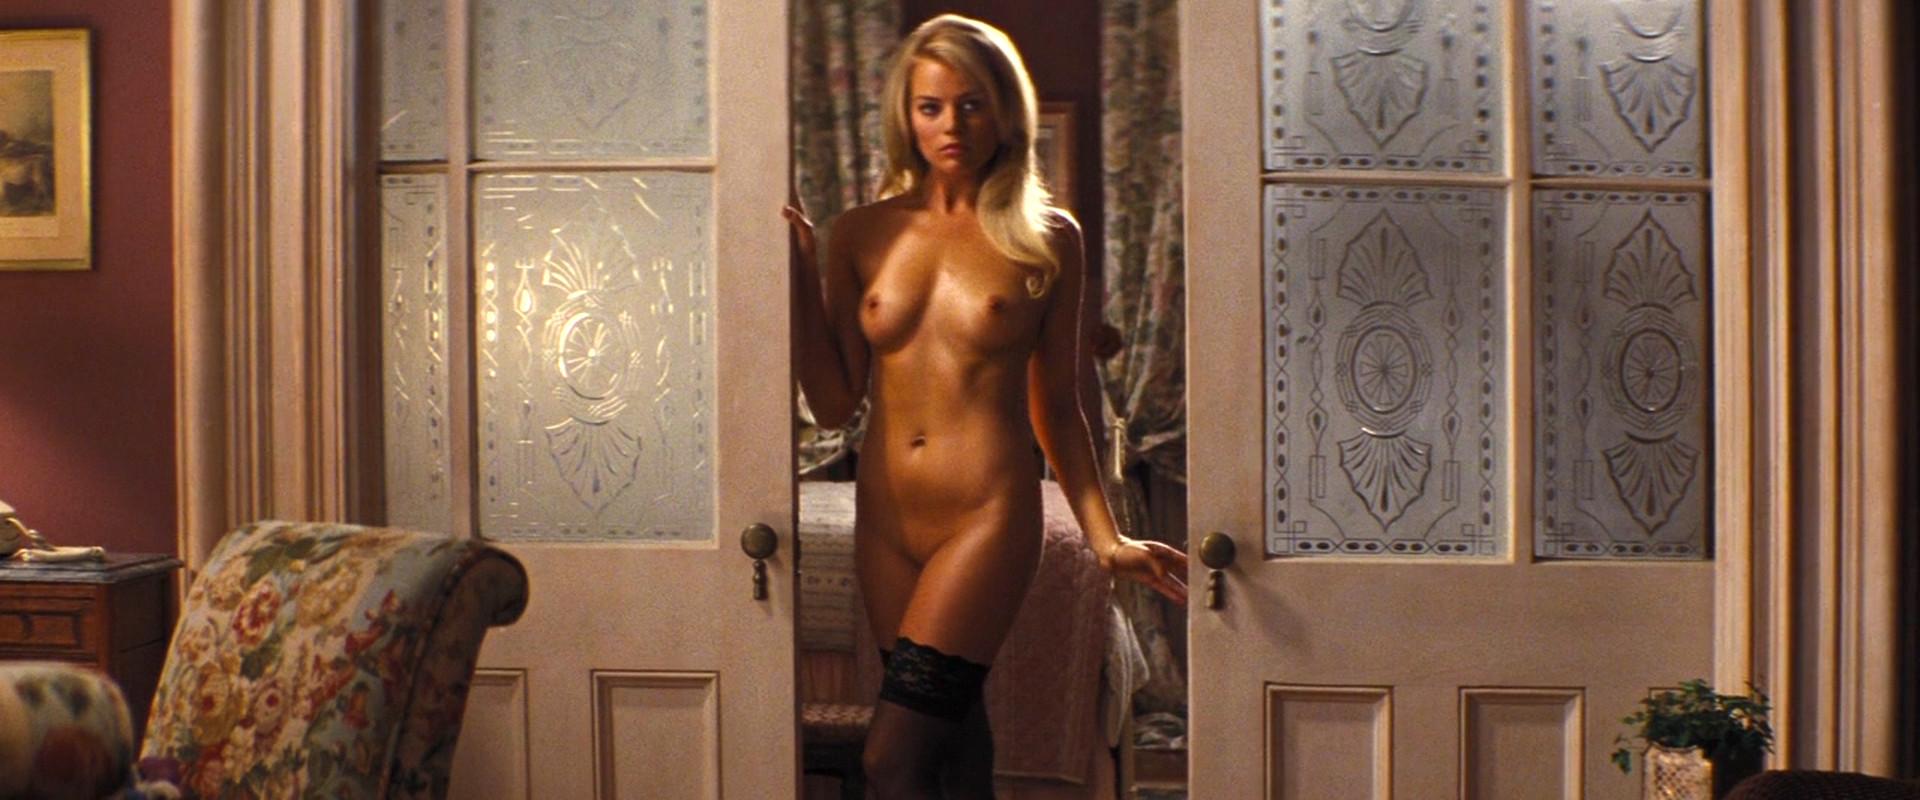 Margot Robbie Naked